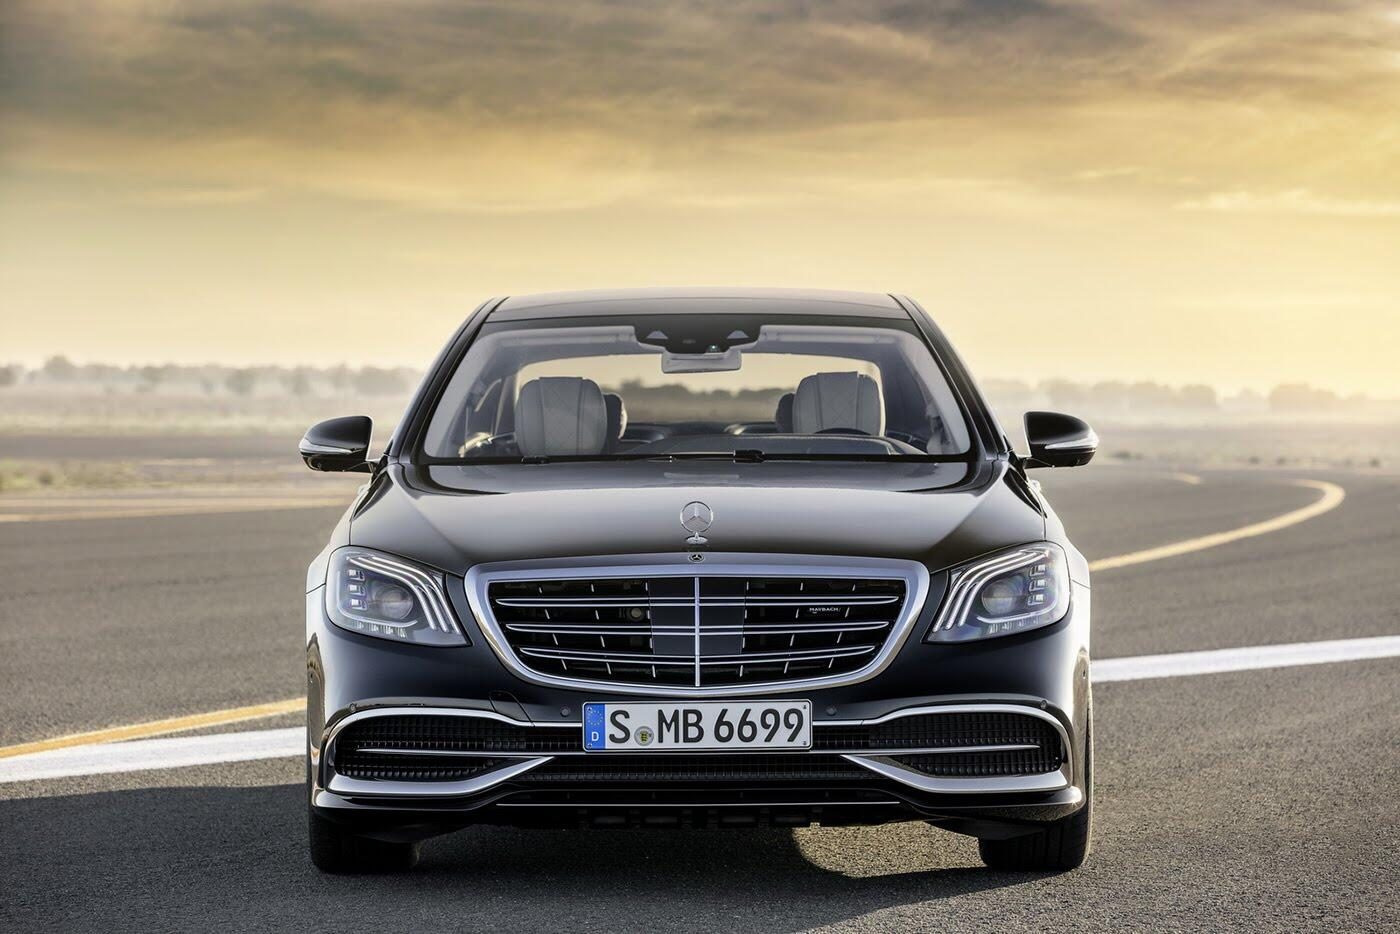 Ảnh chi tiết Mercedes-Benz S-Class 2018 - Hình 9